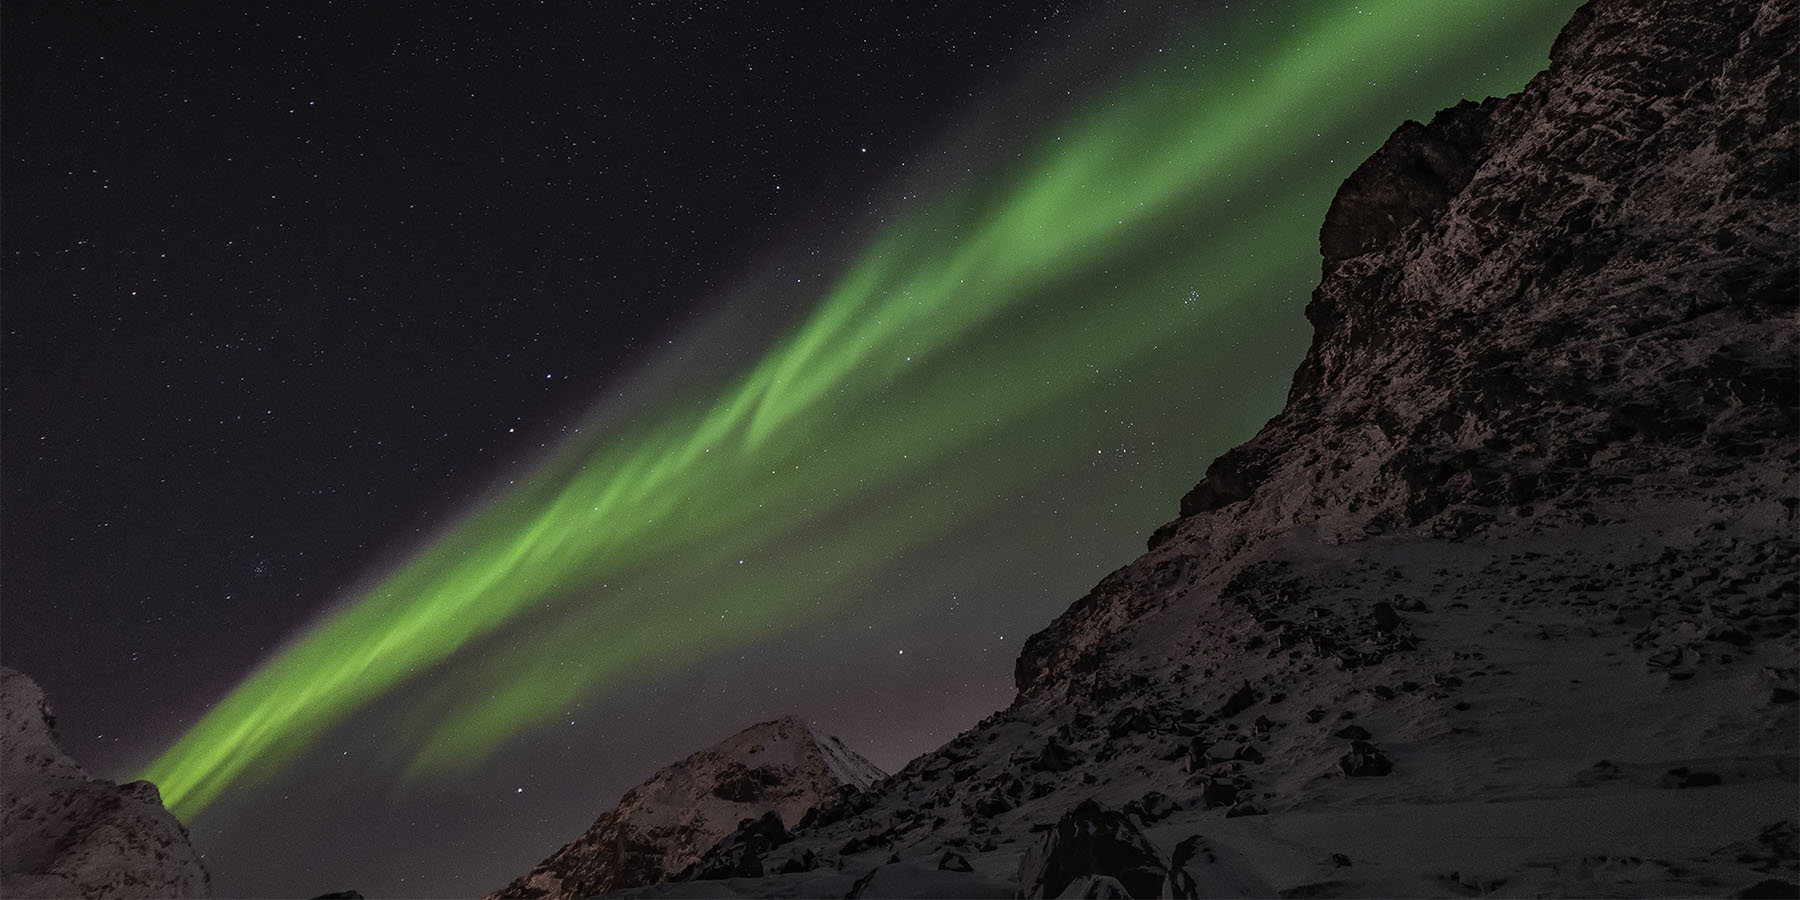 Northern Lights -Lofoten Islands, Norway